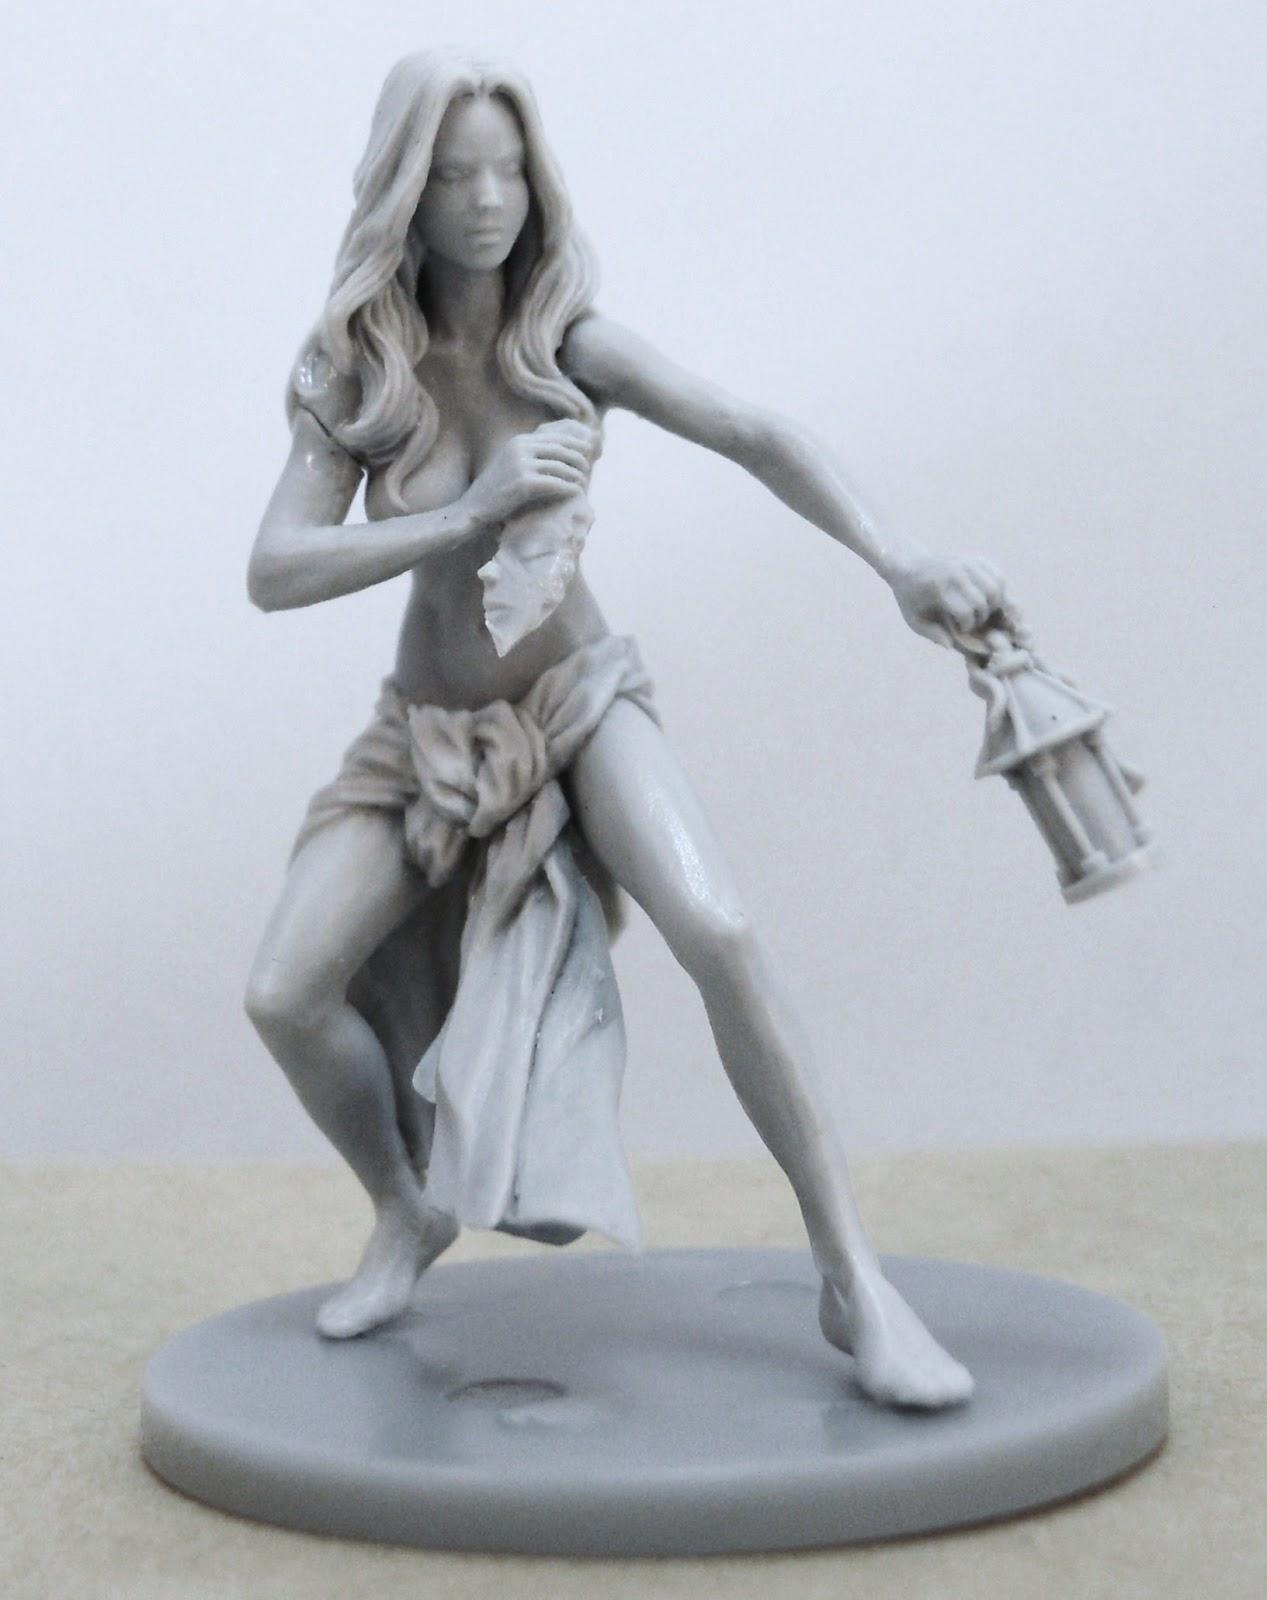 http://1.bp.blogspot.com/-2CmRgYoz3is/UNC1koASr-I/AAAAAAAADfY/6KzgYvonROo/s1600/009+Starter+Female.JPG